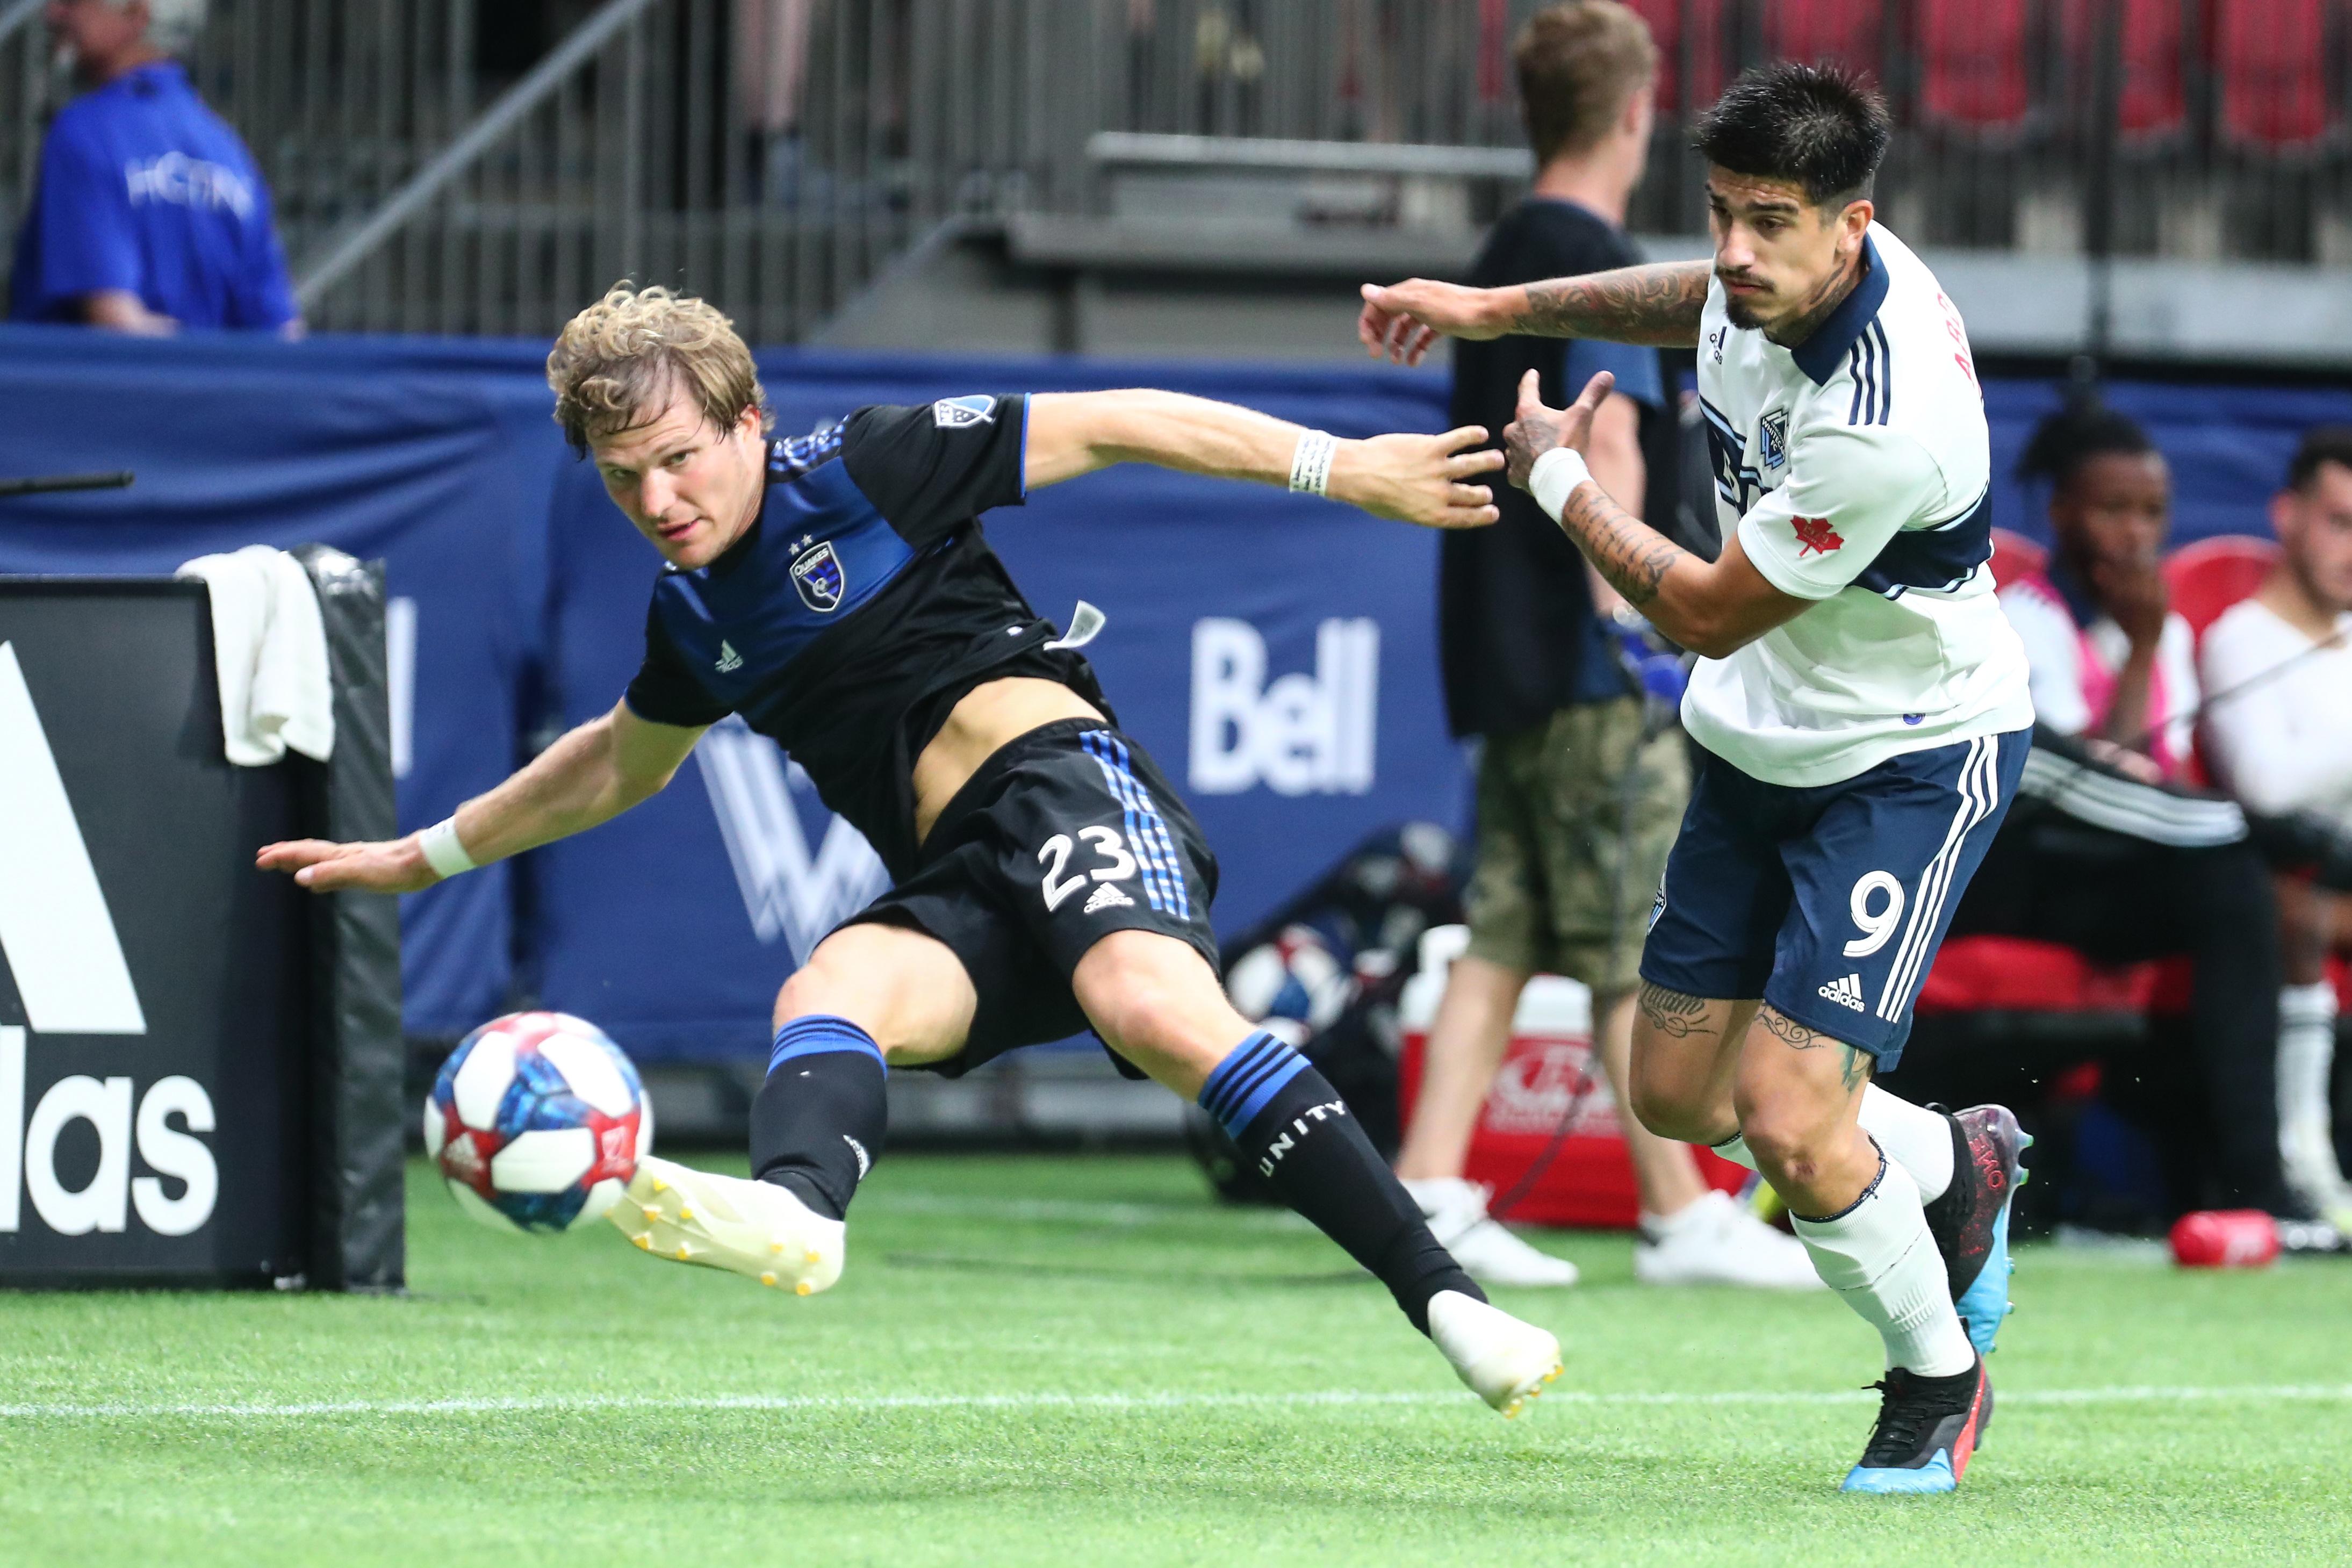 SOCCER: JUL 20 MLS - San Jose Earthquakes at Vancouver Whitecaps